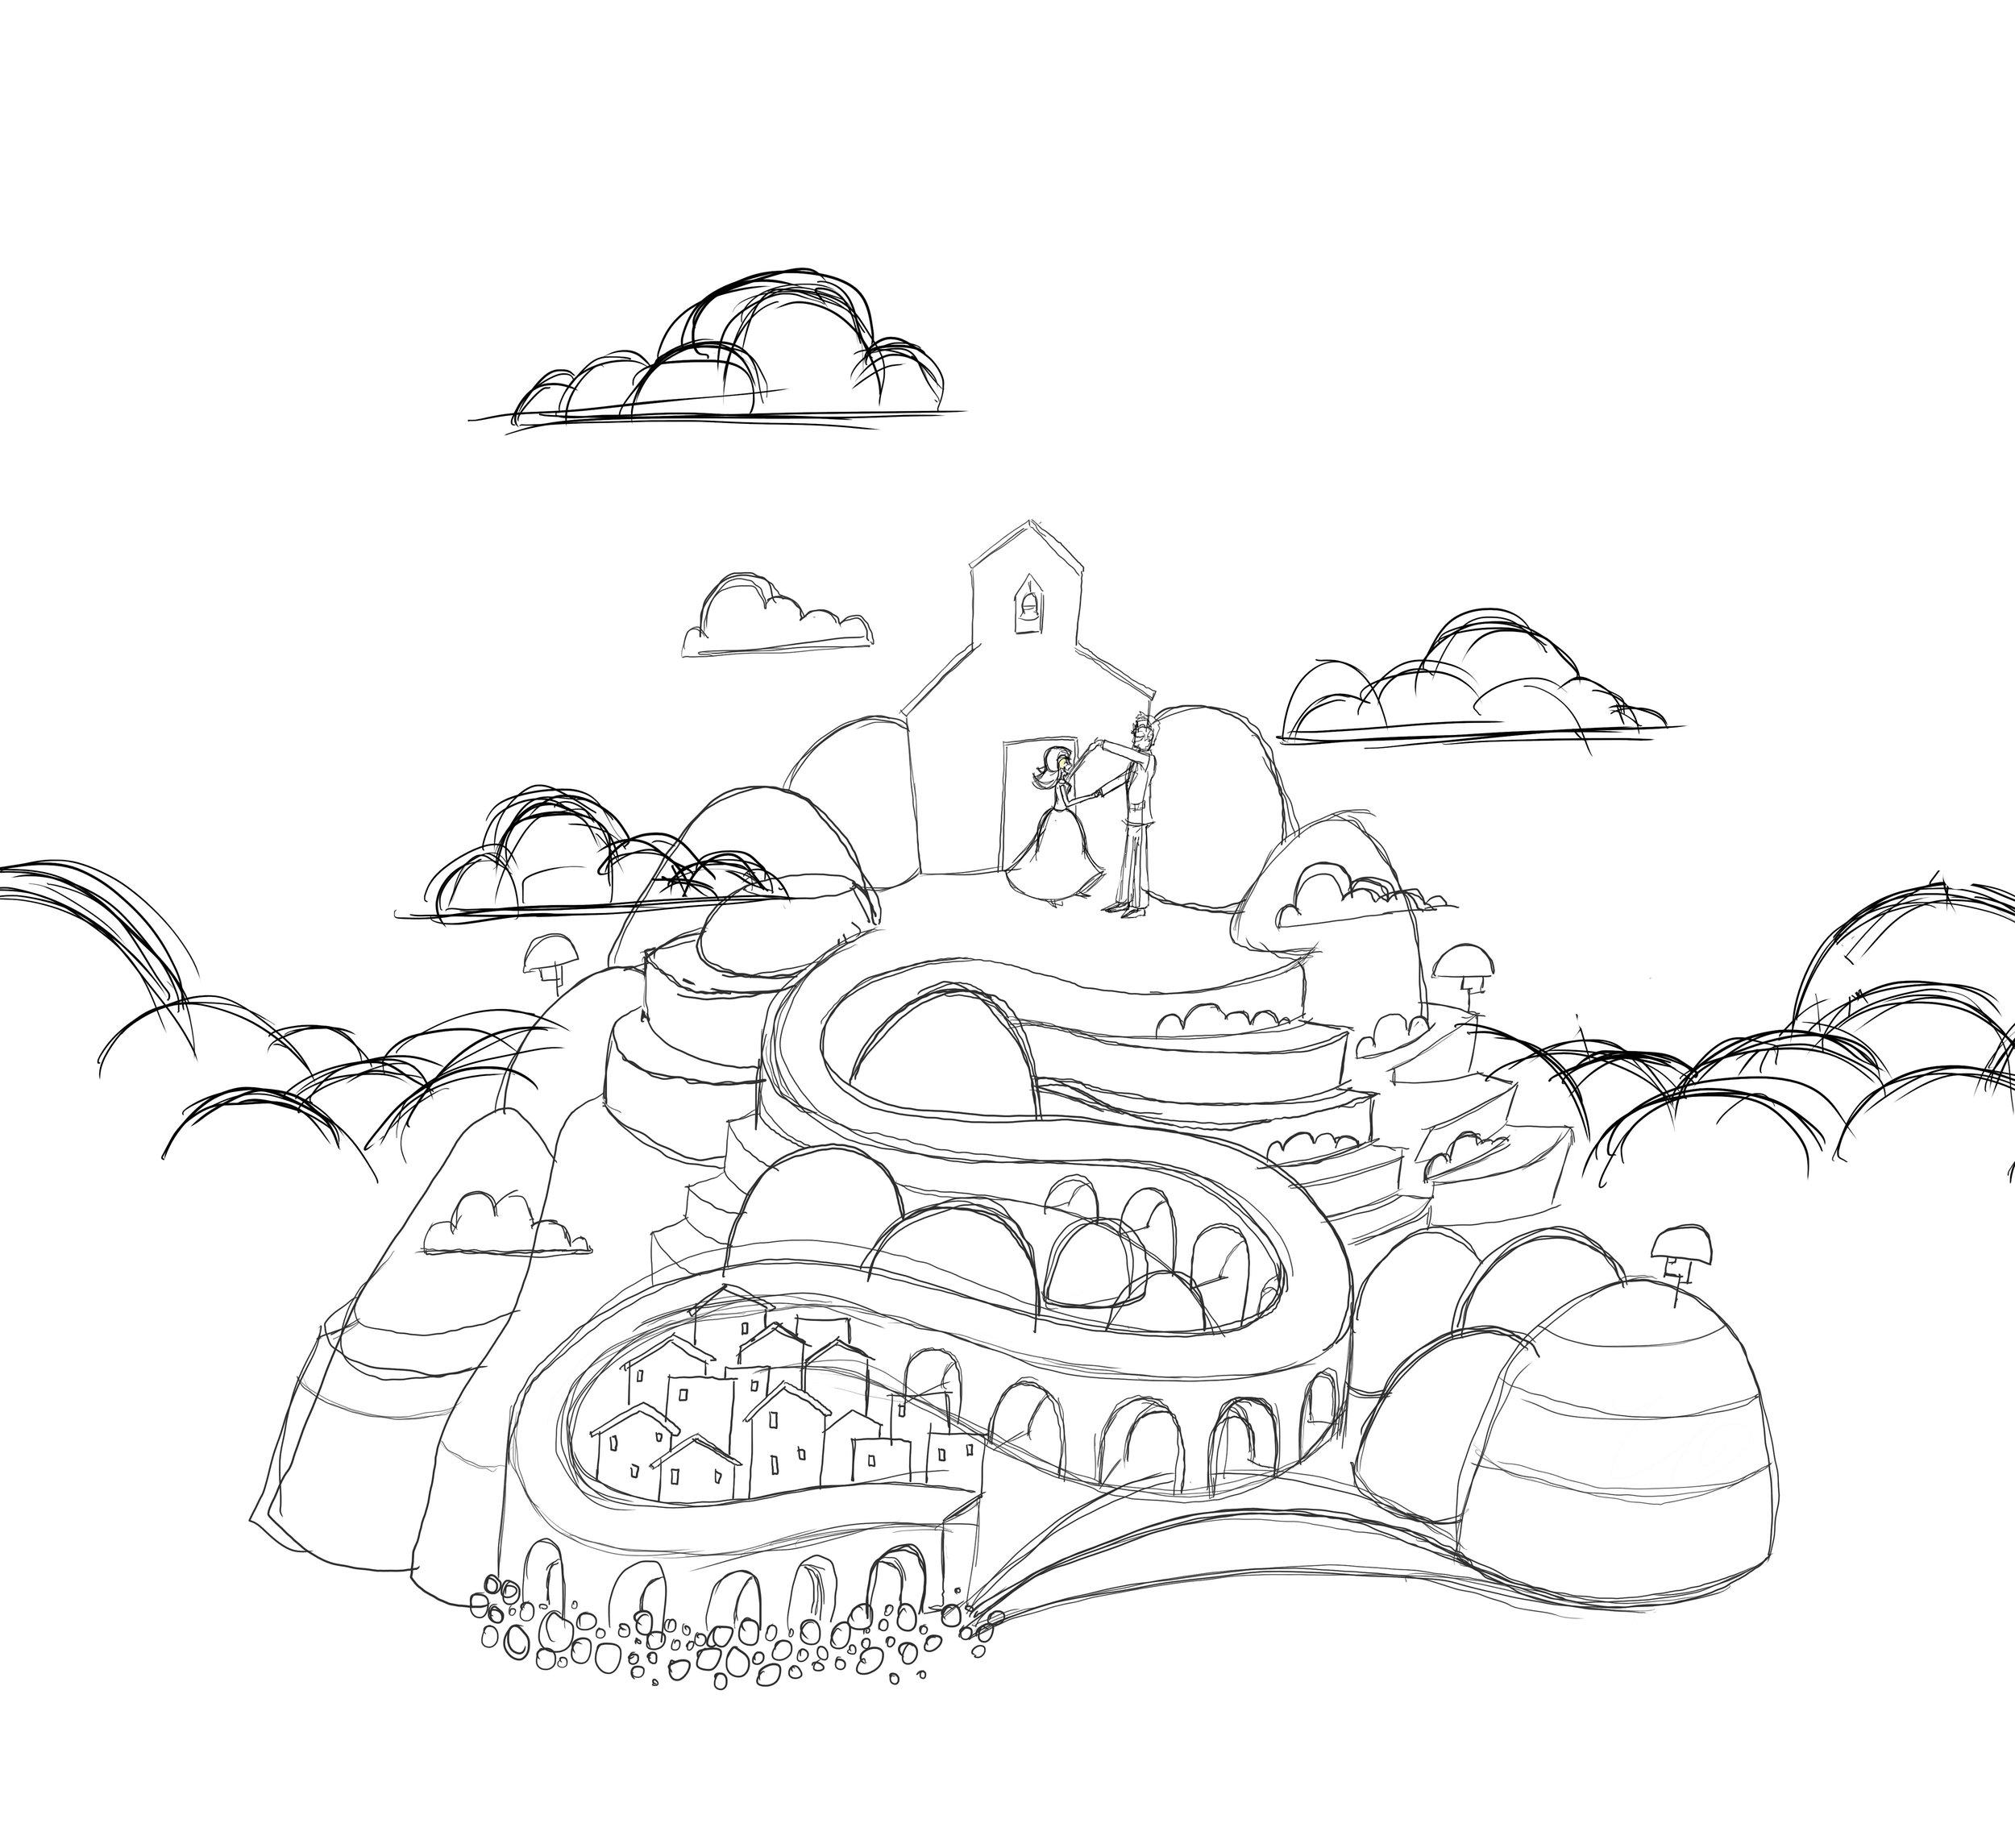 Reddin-designs-itialian-wedding-sketch-illustration.jpg